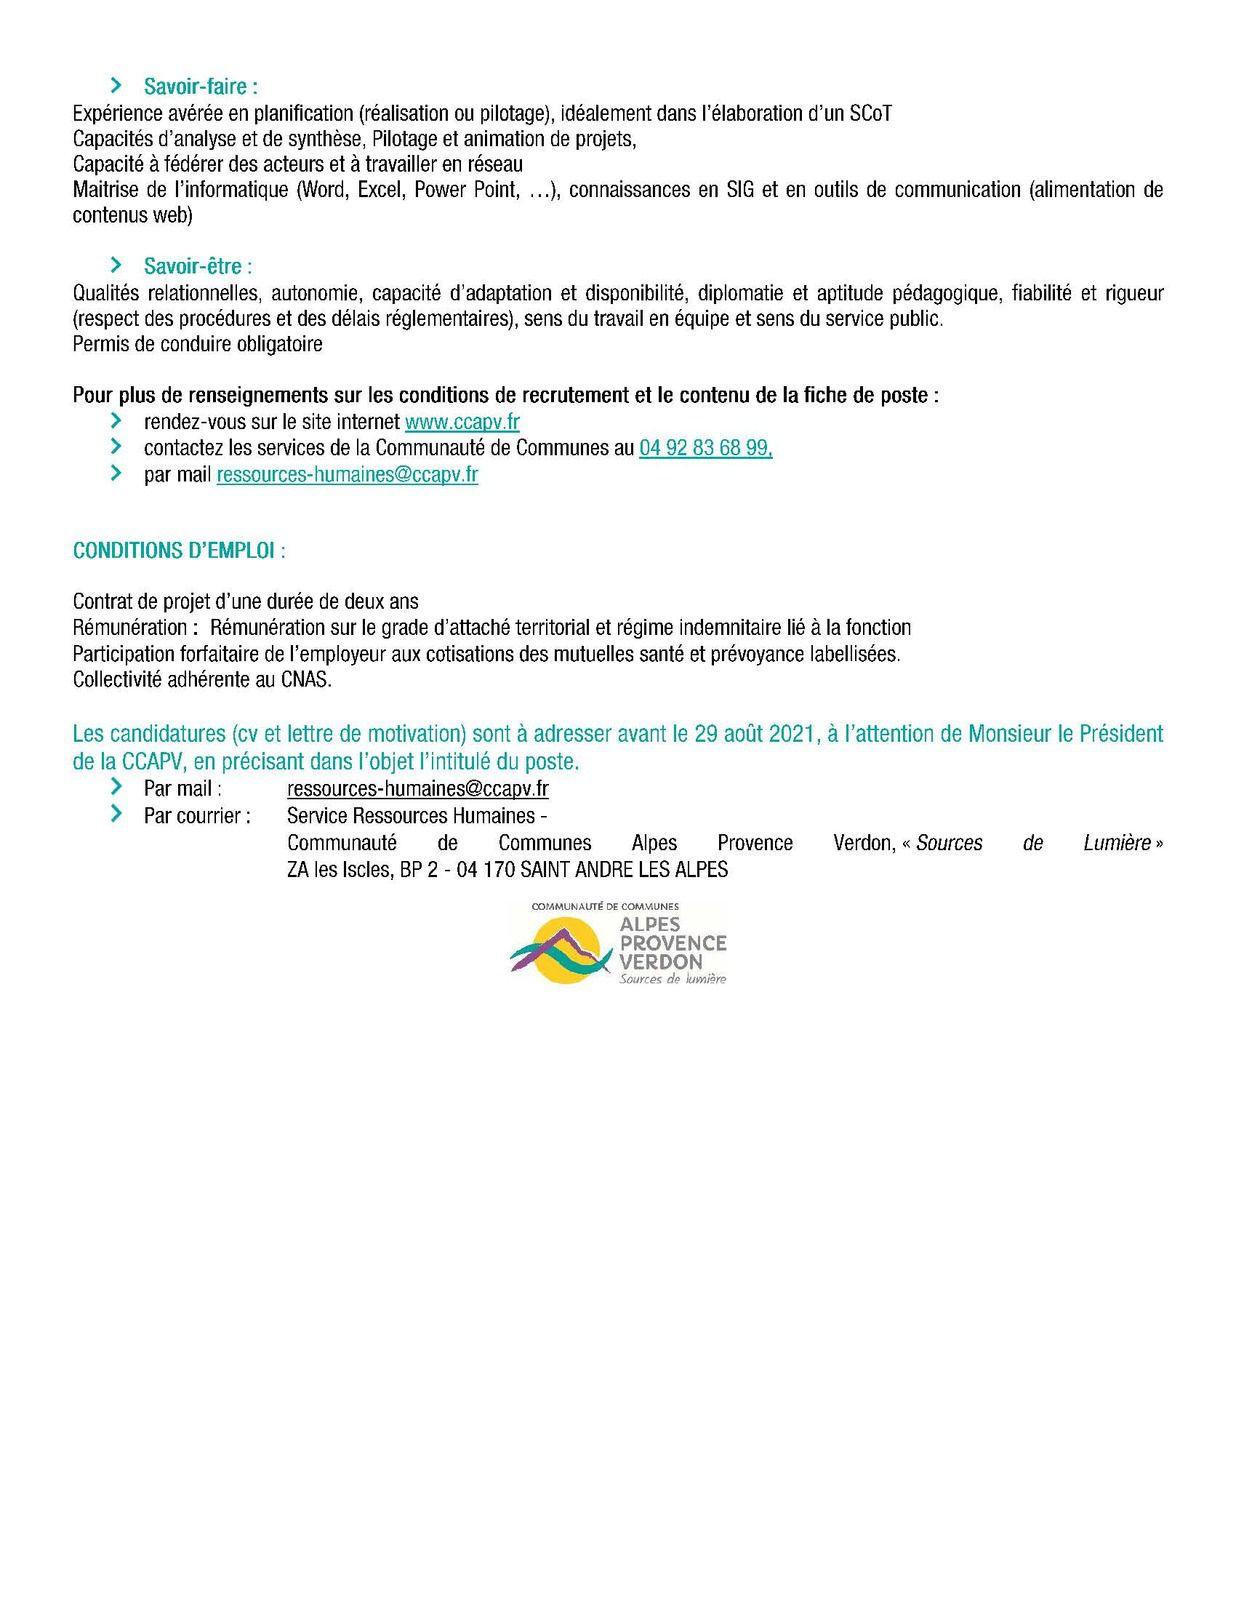 Offre emploi CCAPV  : Un(e) chef de projet scot (candidature avant 29 août